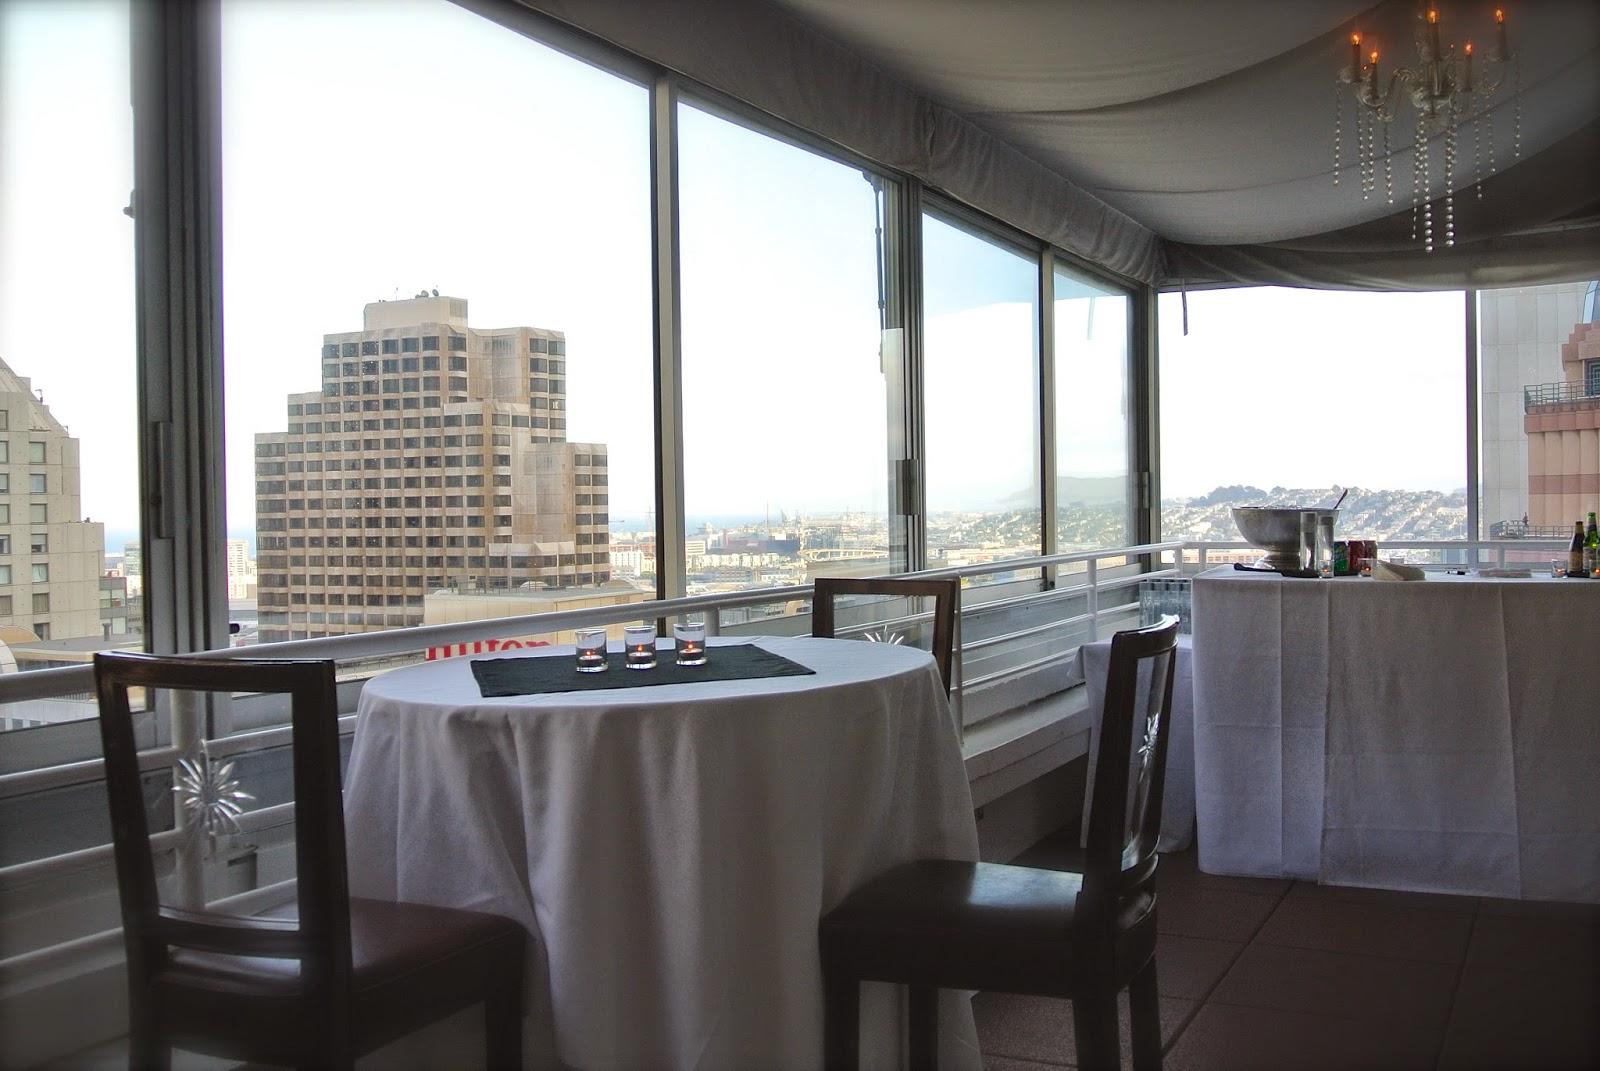 Bar area, view of San Francisco